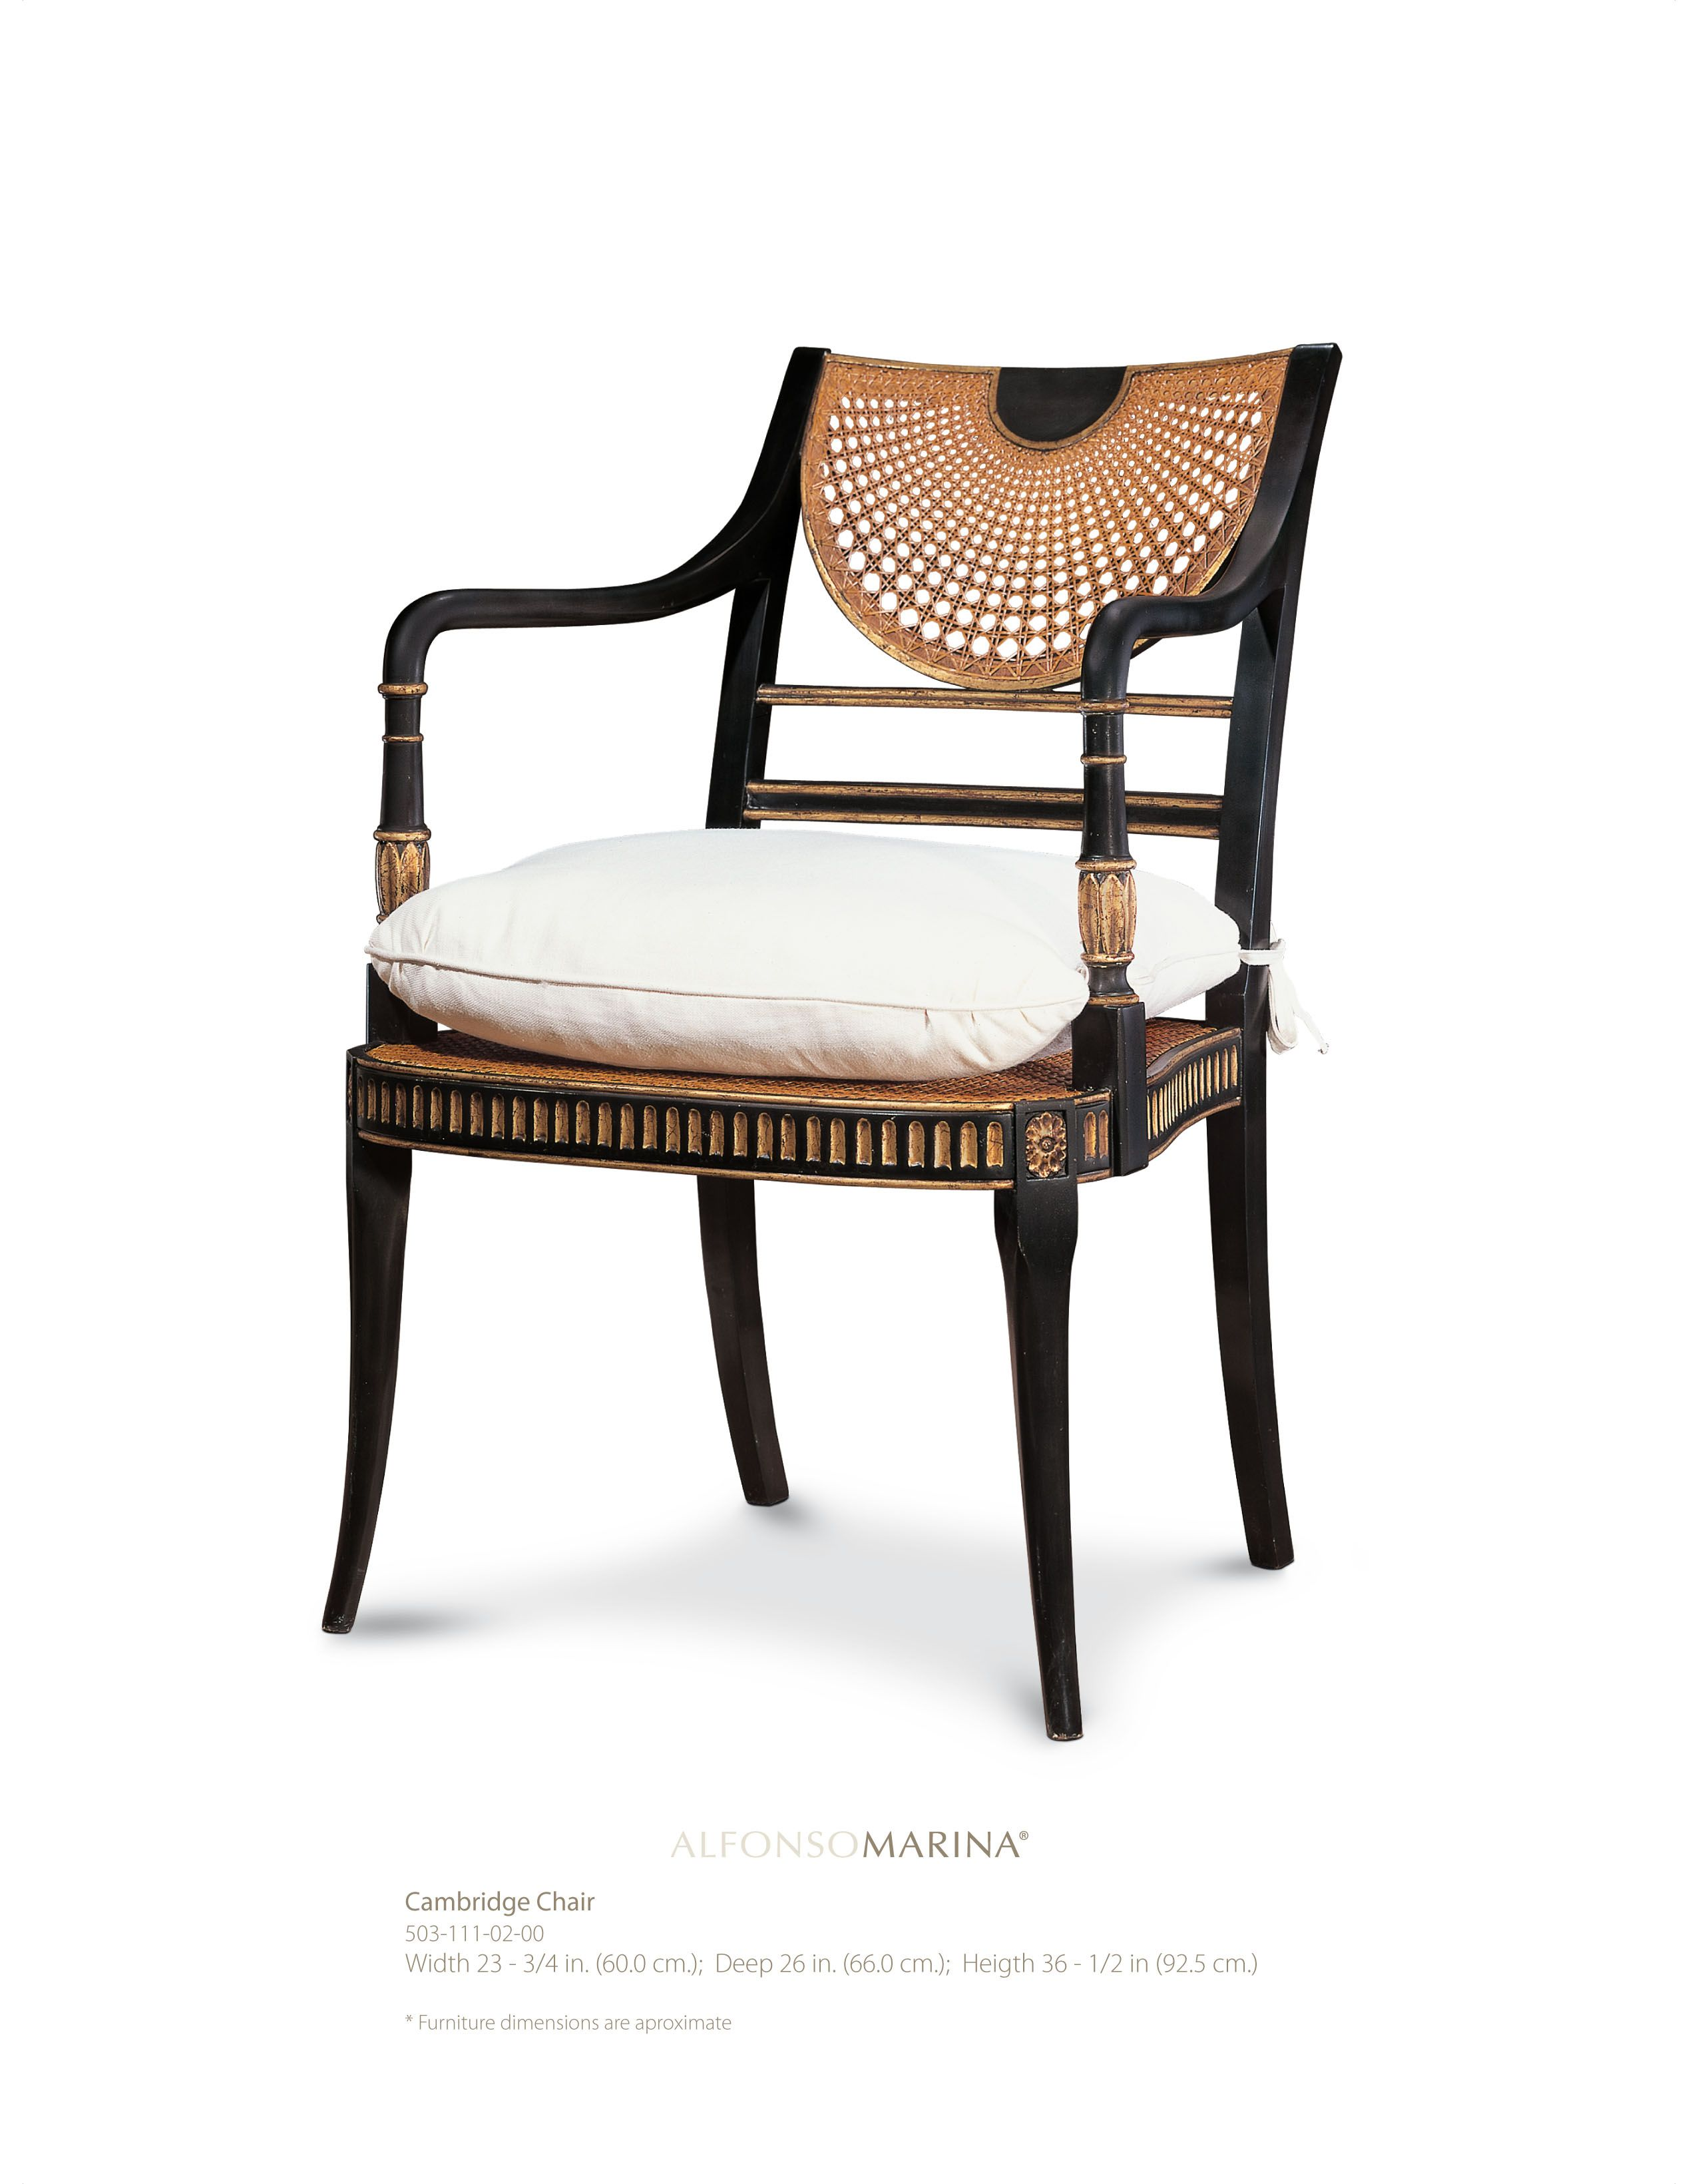 Cambridge Chair by Alfonso Marina Ebanista | Deco | Pinterest